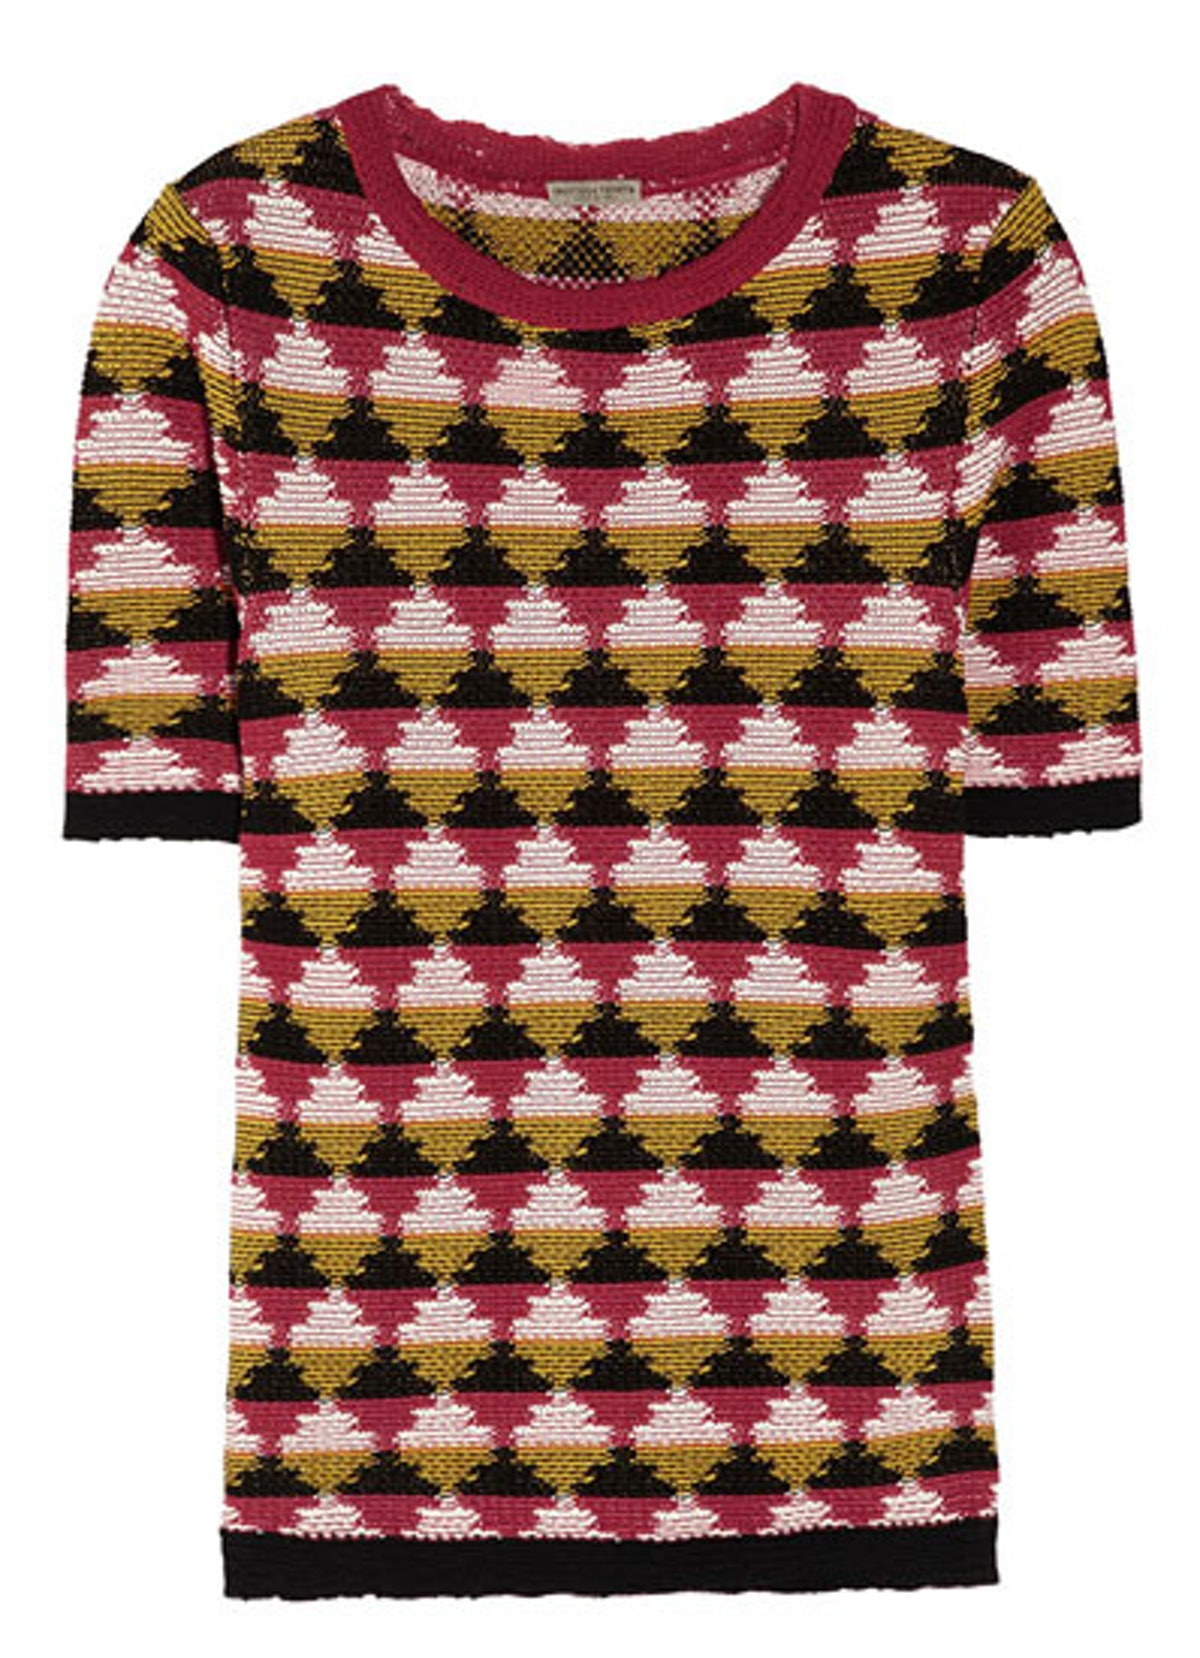 fass-graphic-knits-02-v.jpg